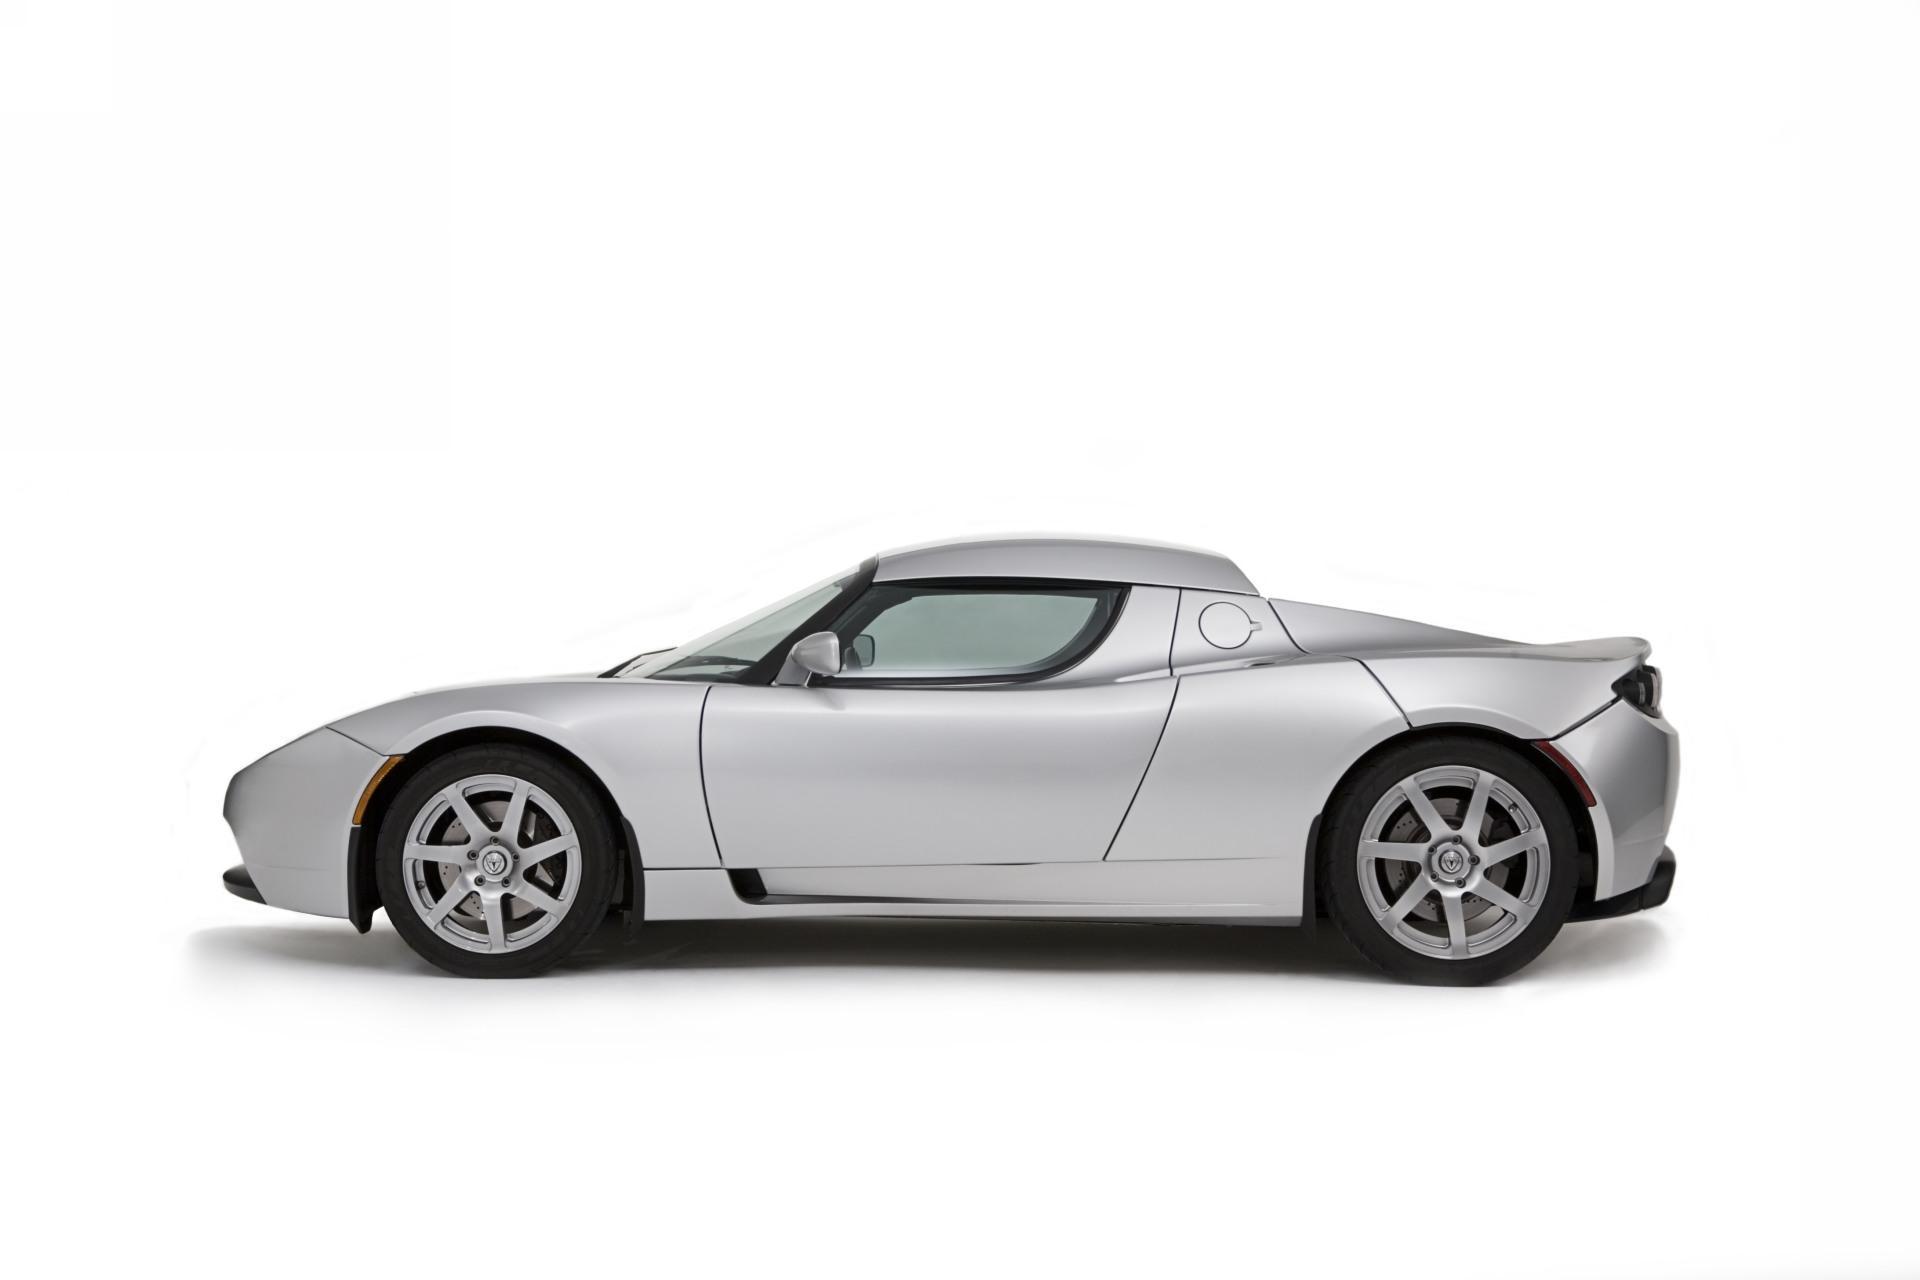 2010 Tesla Roadster Desktop Wallpaper And High Resolution